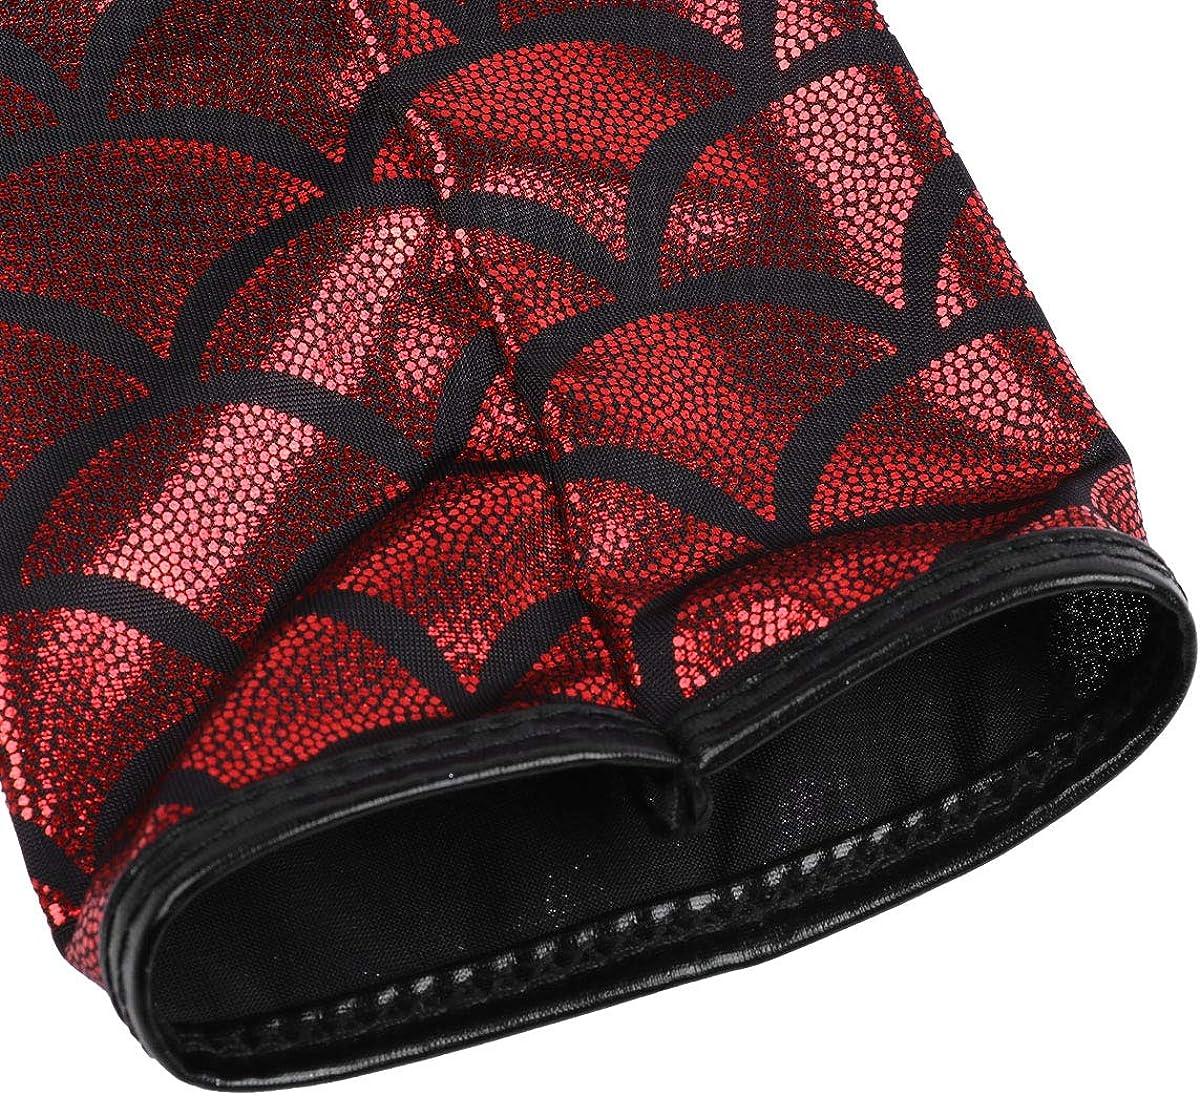 inlzdz Damen Gl/änzend Handschuhe Metallic Fingerlose Lange Handschuhe Wetlook Lederhandschuhe Tanz Party Clubwear Kost/üm 16 Farben